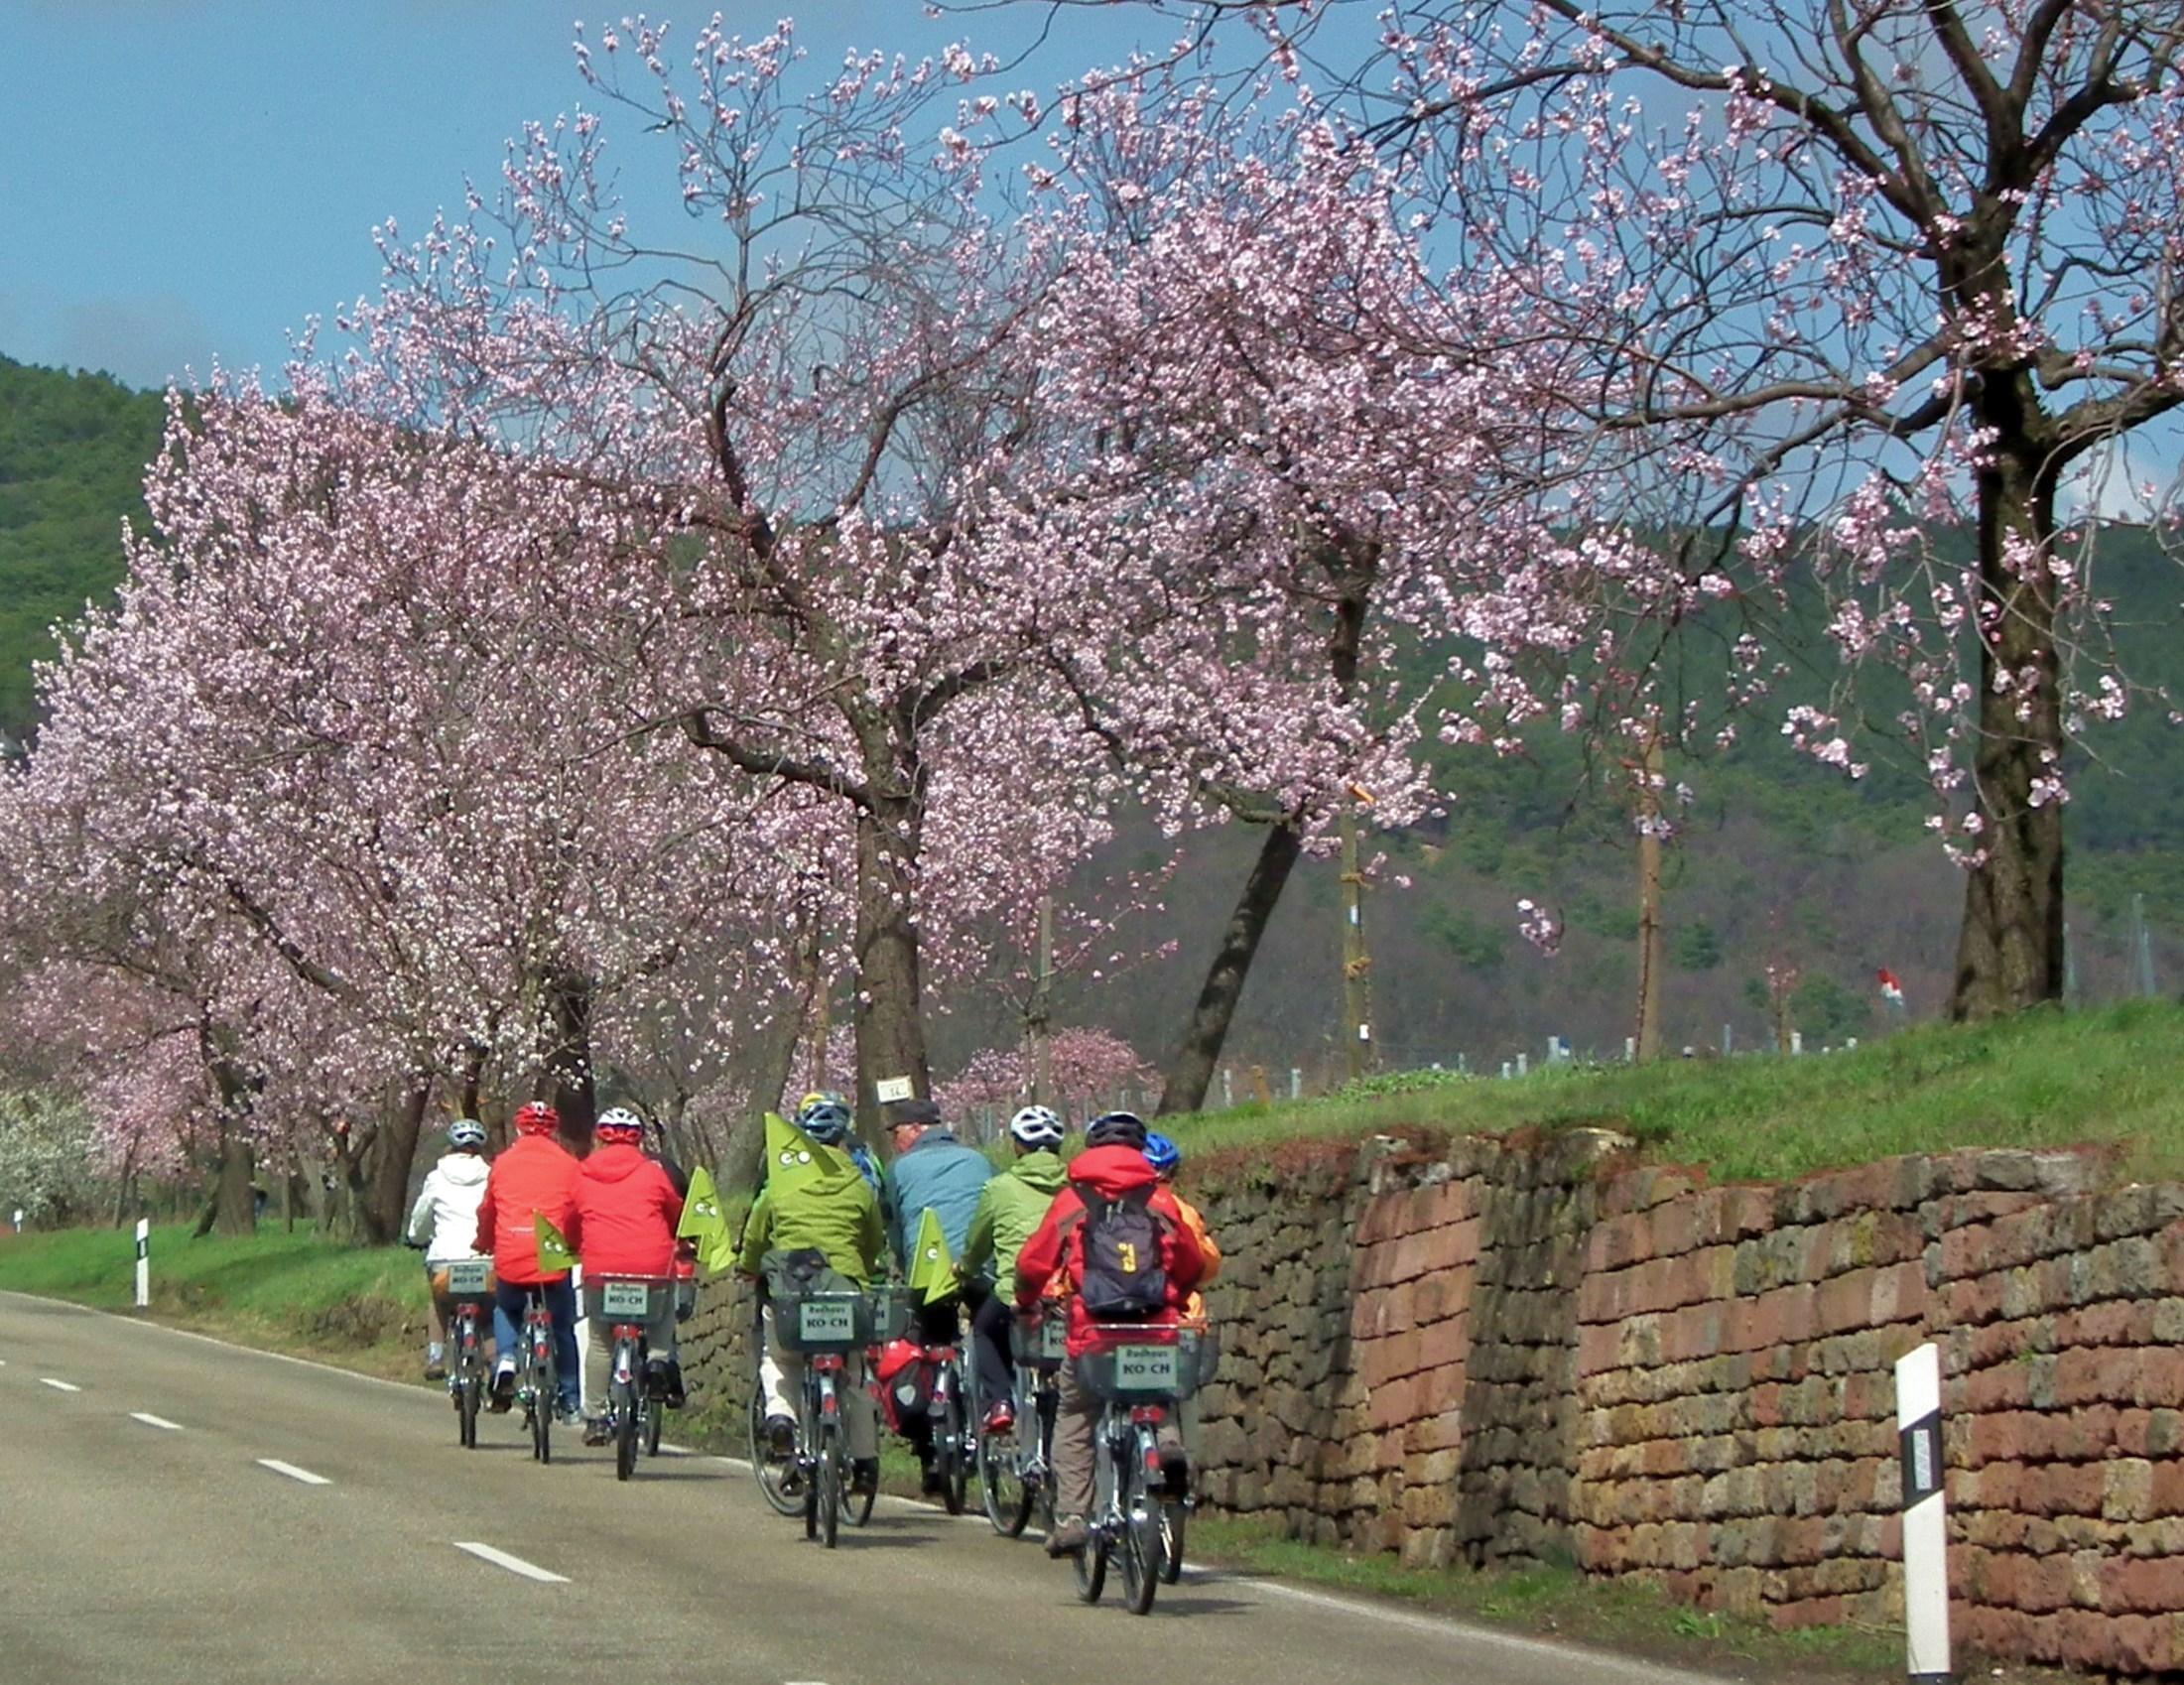 Gimmeldingen feiert am kommenden Wochenende Mandelblütenfest